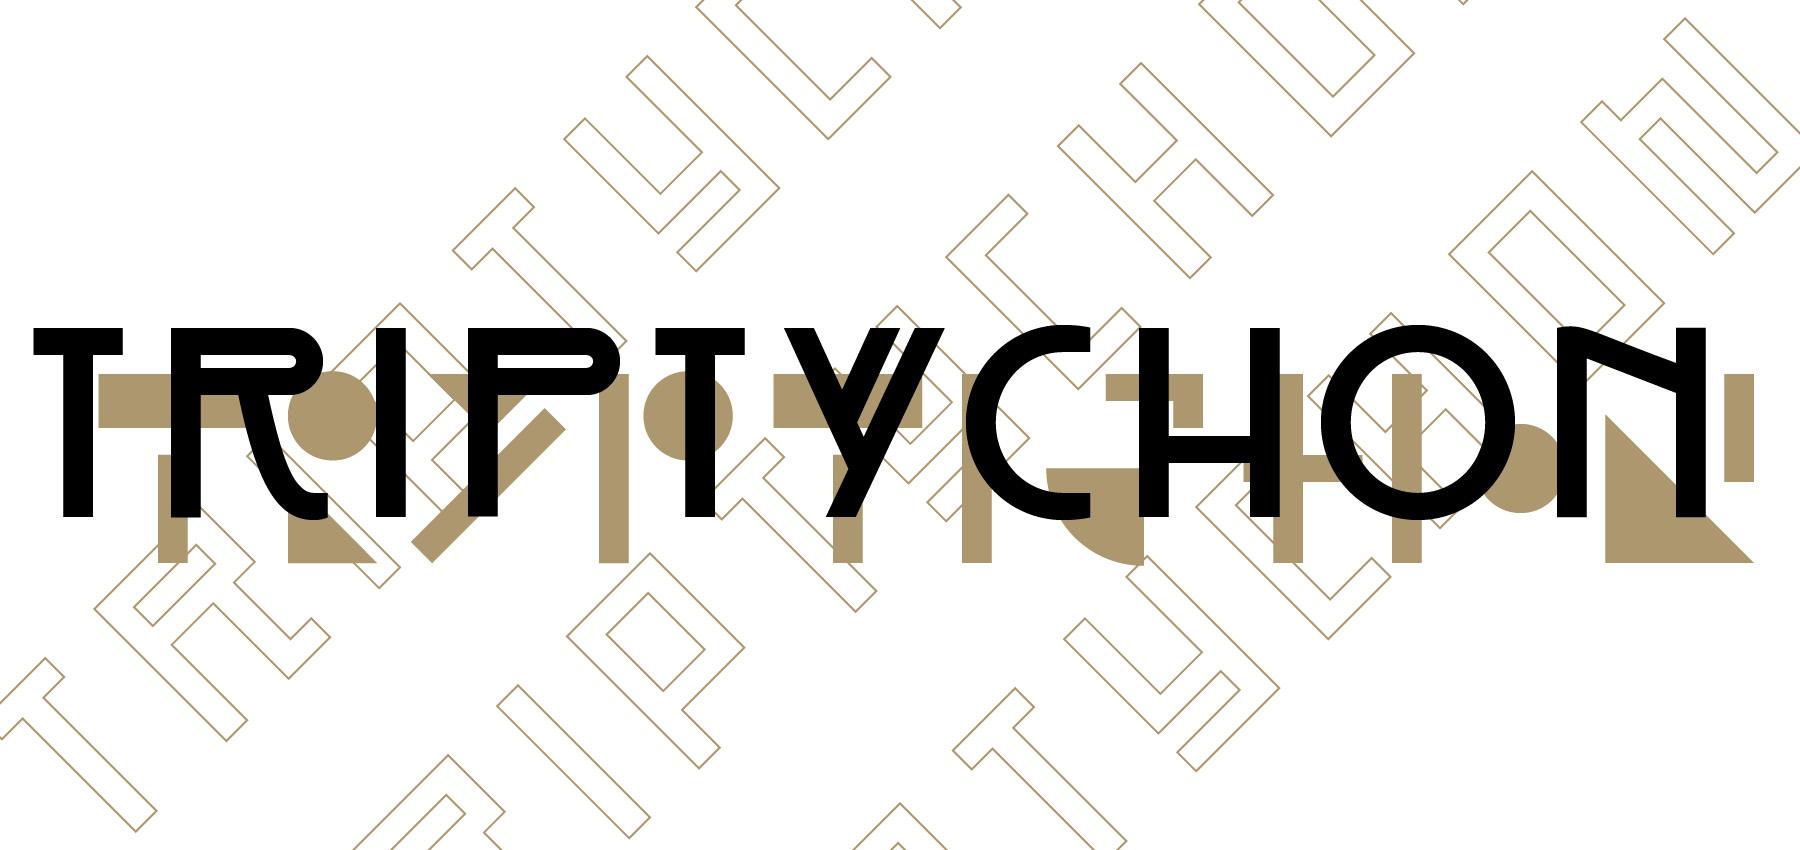 18 8 triptychon